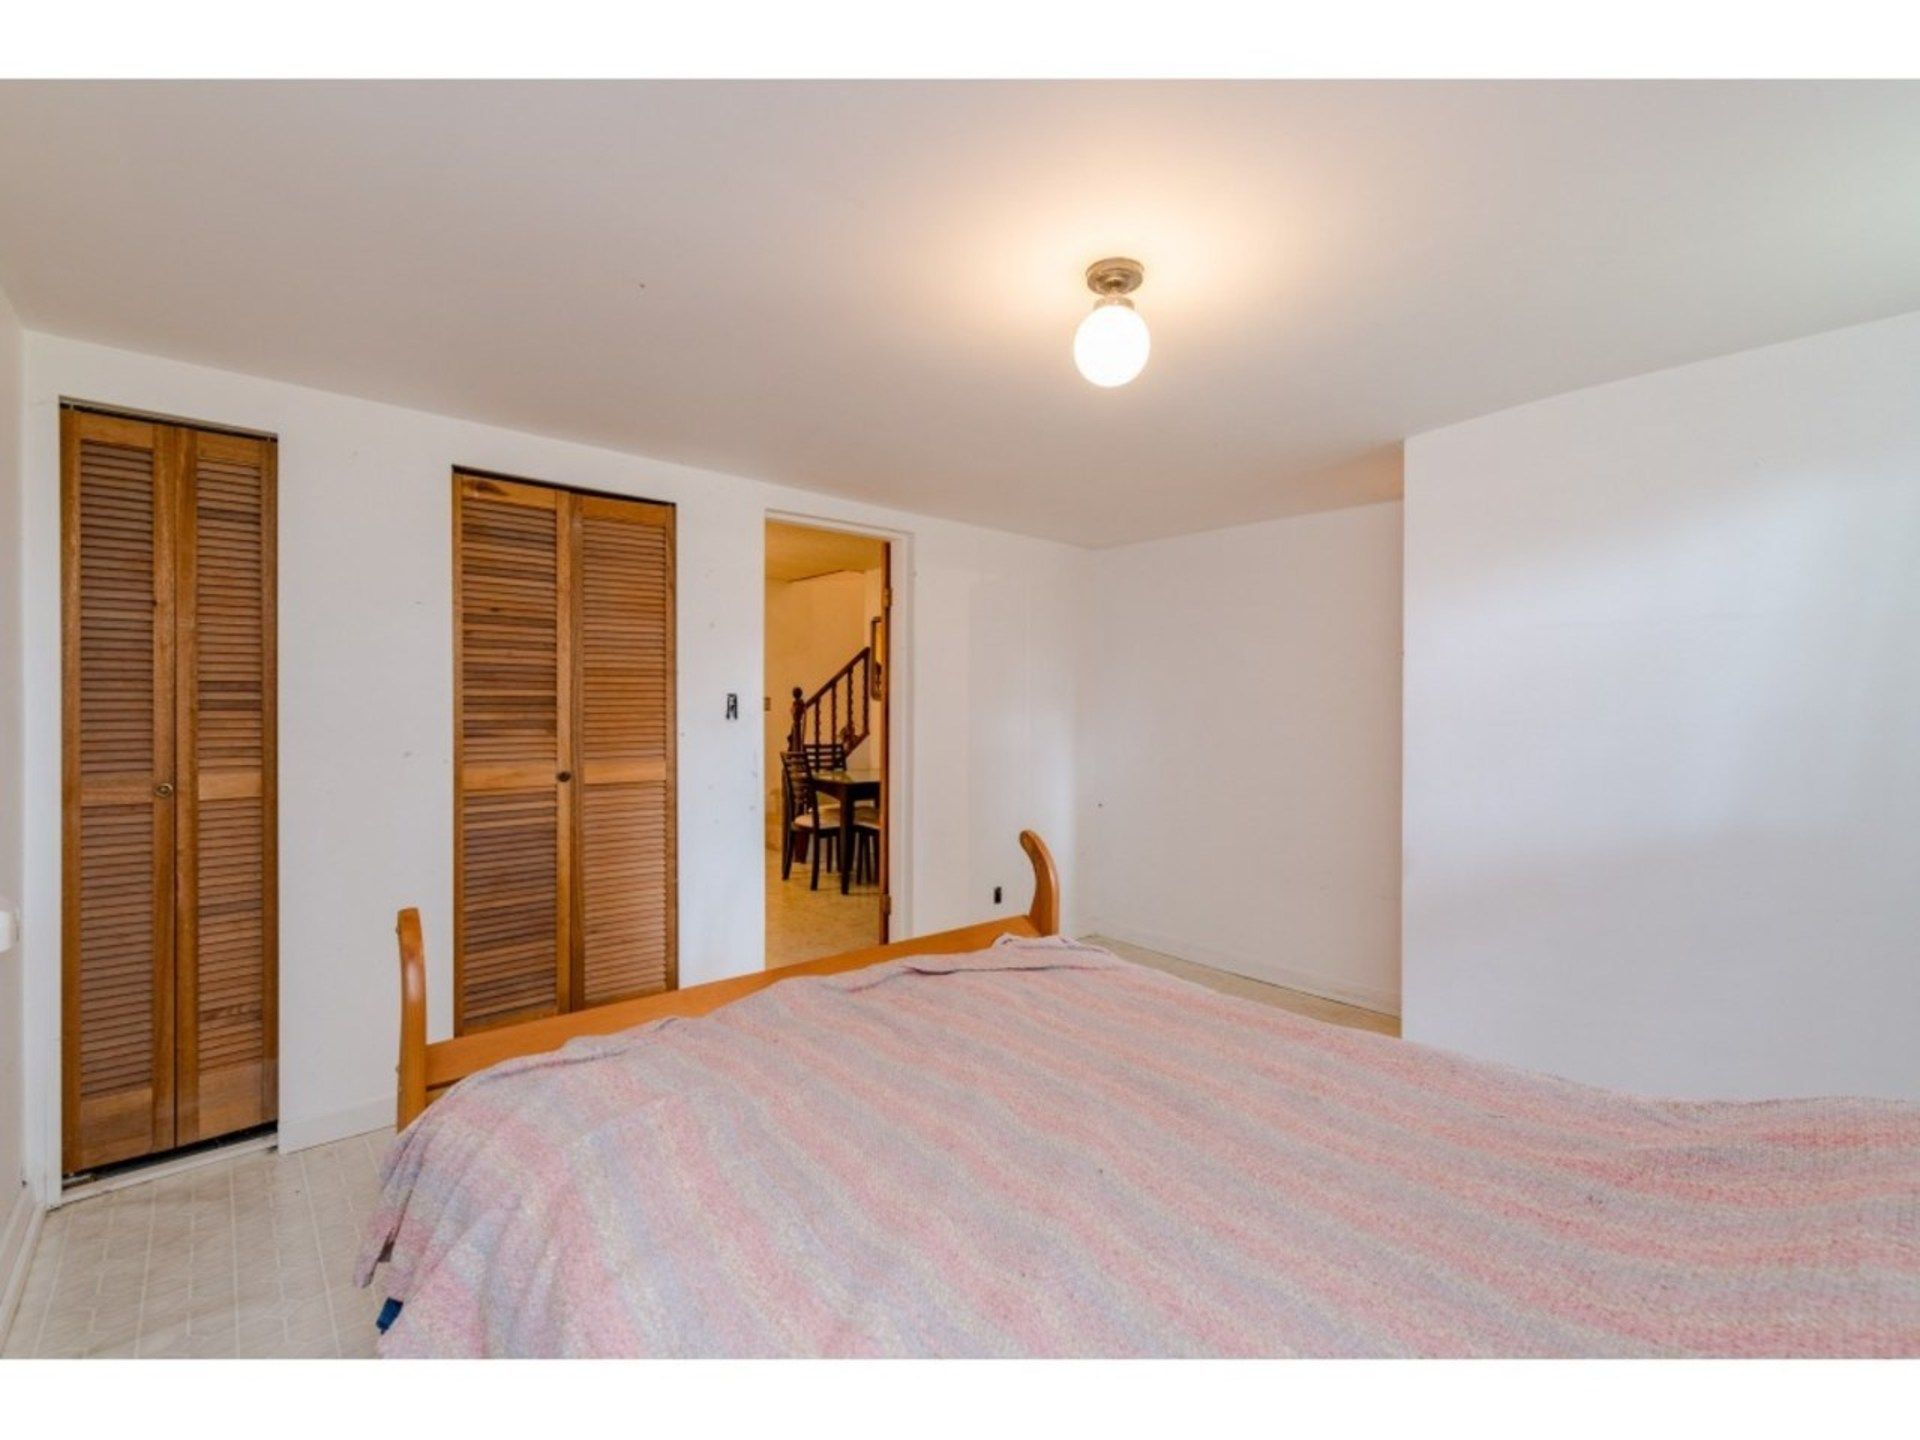 5771-172-street-cloverdale-bc-cloverdale-15 at 5771 172 Street, Cloverdale BC, Cloverdale